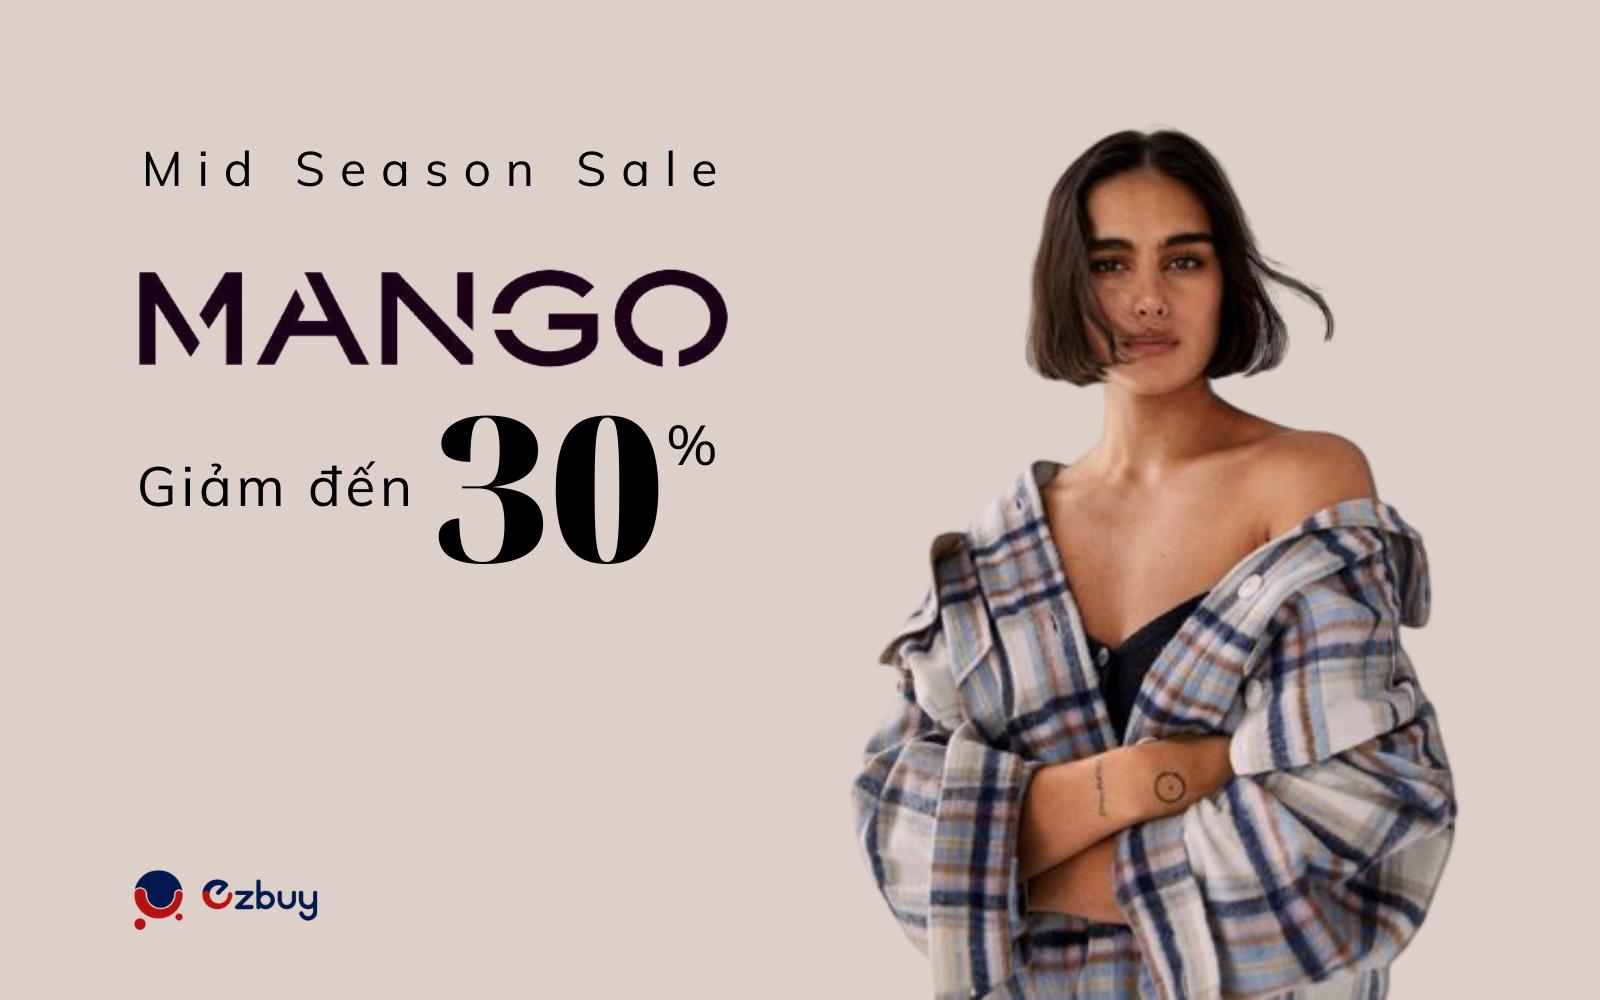 Mango mở đại tiệc sale mùa hè - Giảm đến 30%